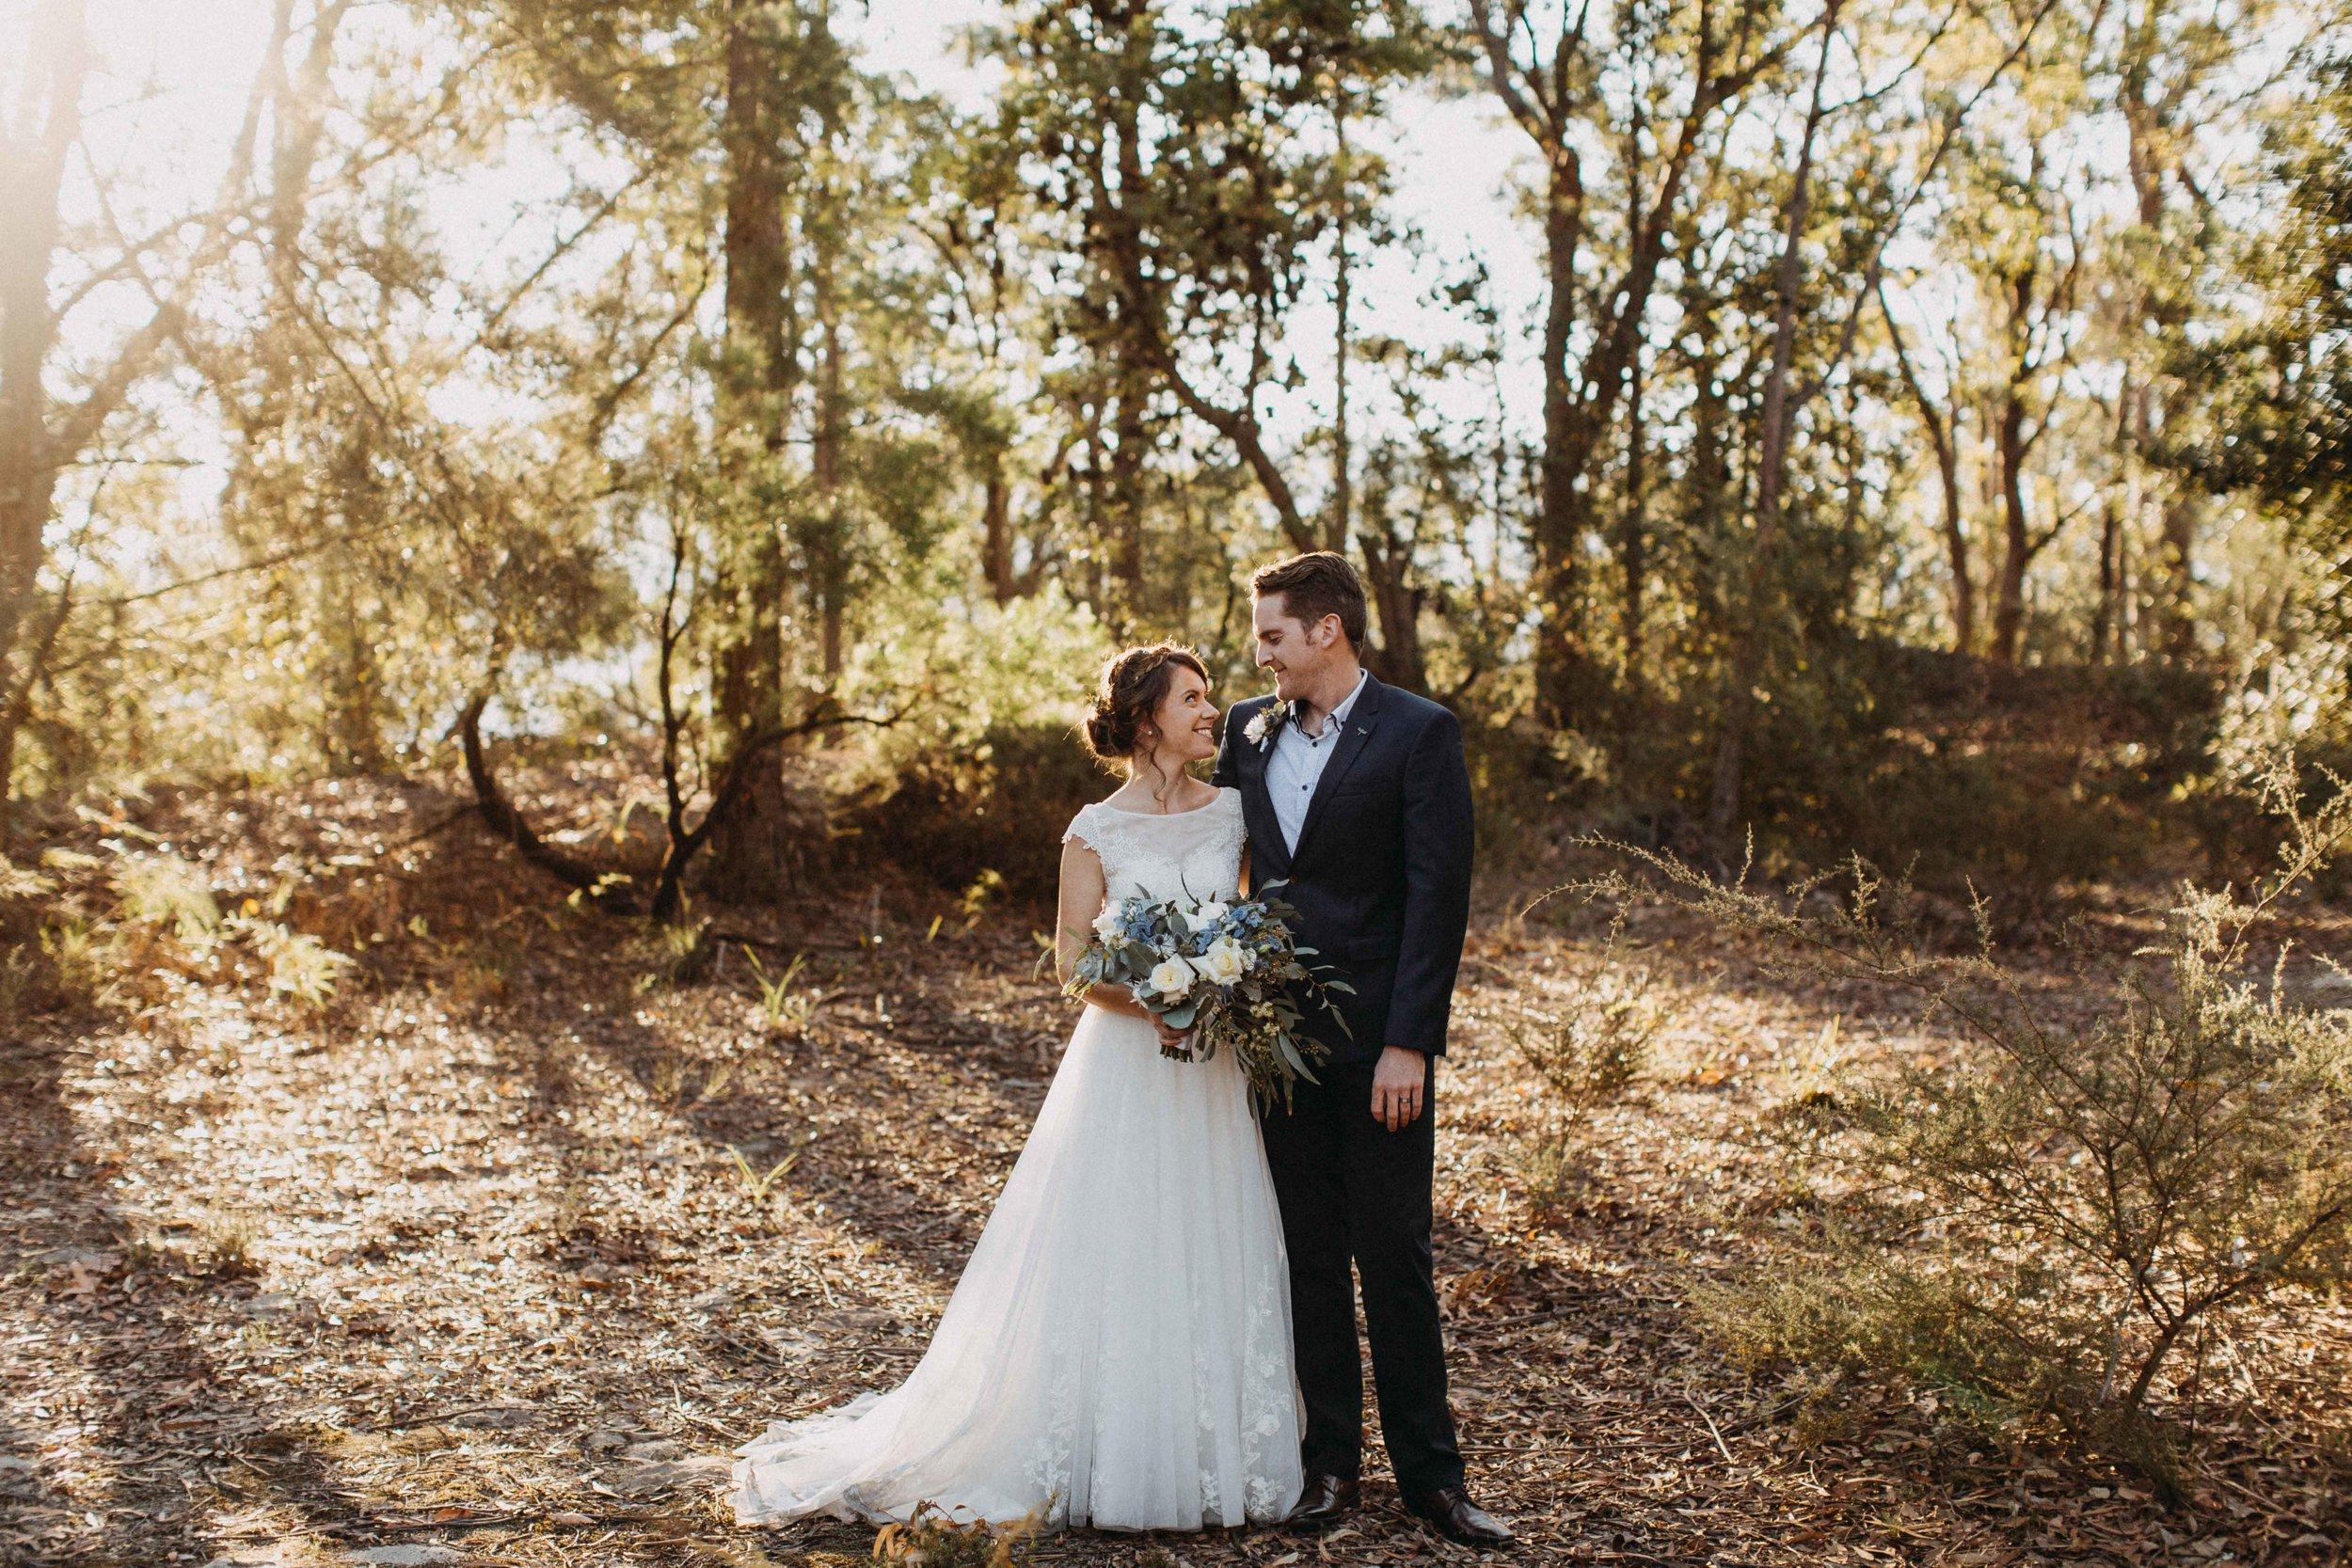 kangaroo-valley-bush-retreat-wedding-lydia-nate-www.emilyobrienphotography.net-90.jpg